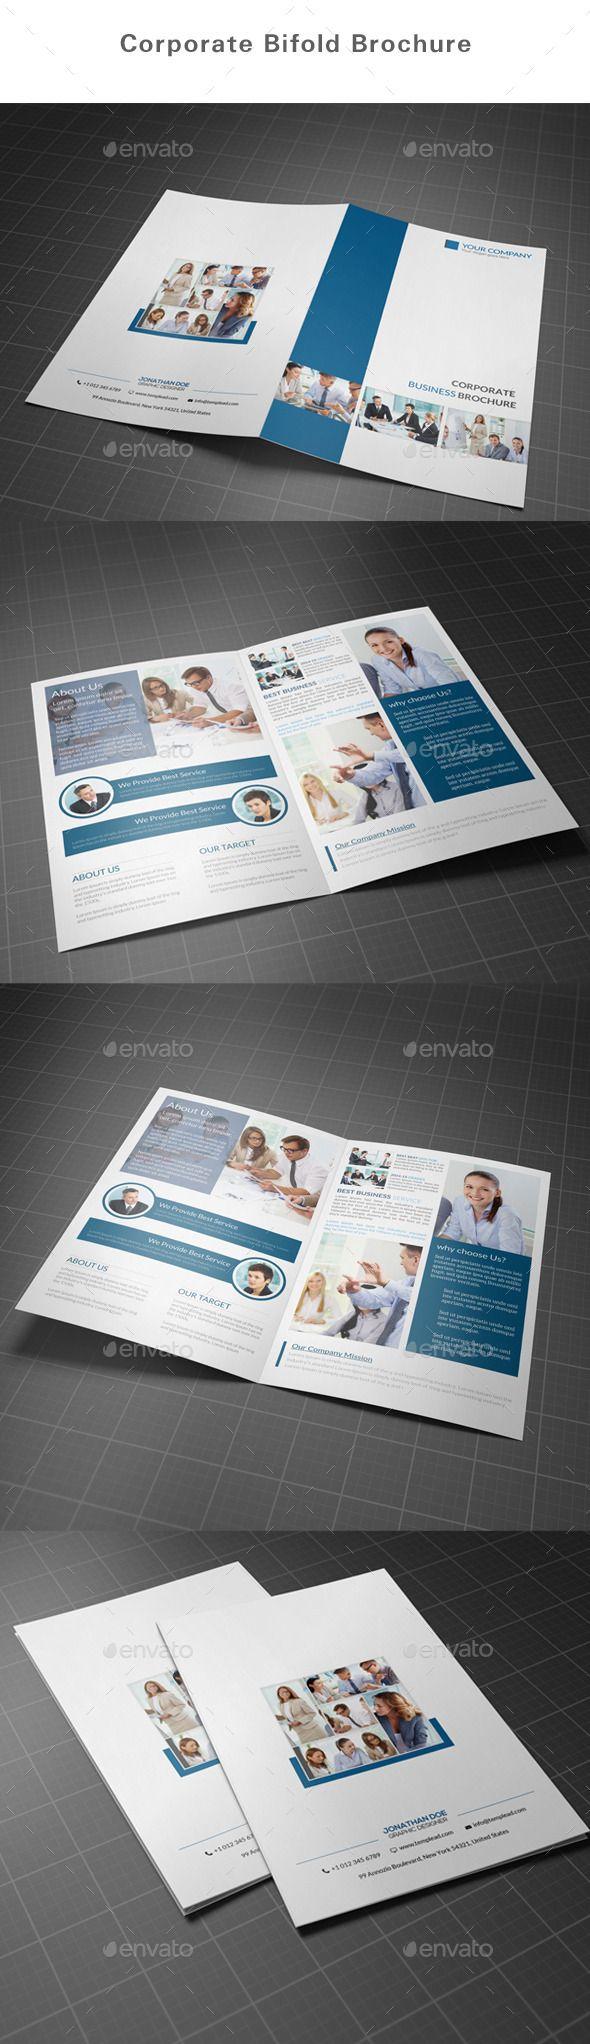 Corporate Bifold Brochure Template. Download: http://graphicriver.net/item/corporate-bifold-brochure/10991163?ref=ksioks